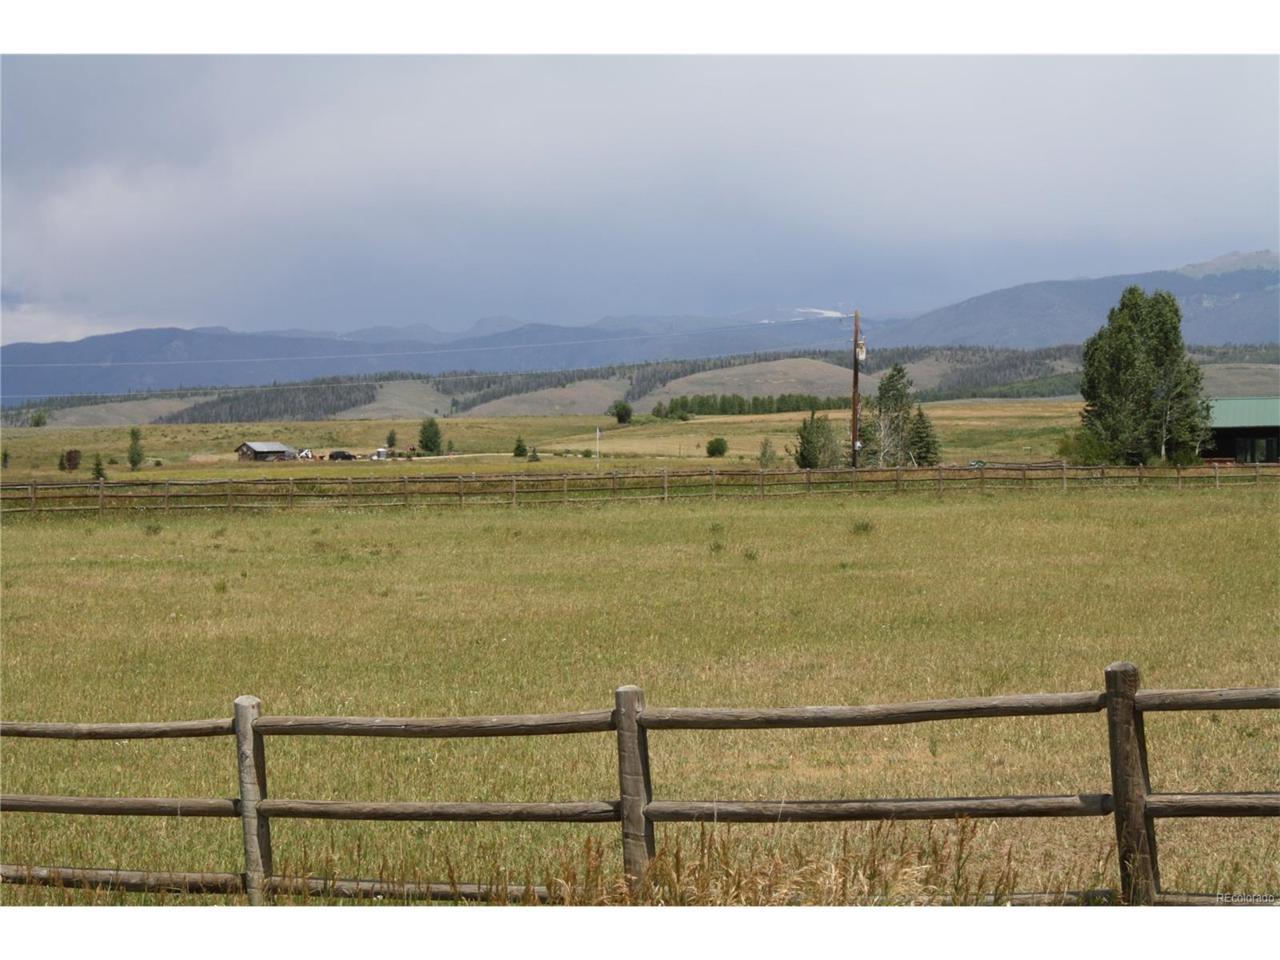 127 County Road 609, Granby, CO 80446 (MLS #6215202) :: 8z Real Estate